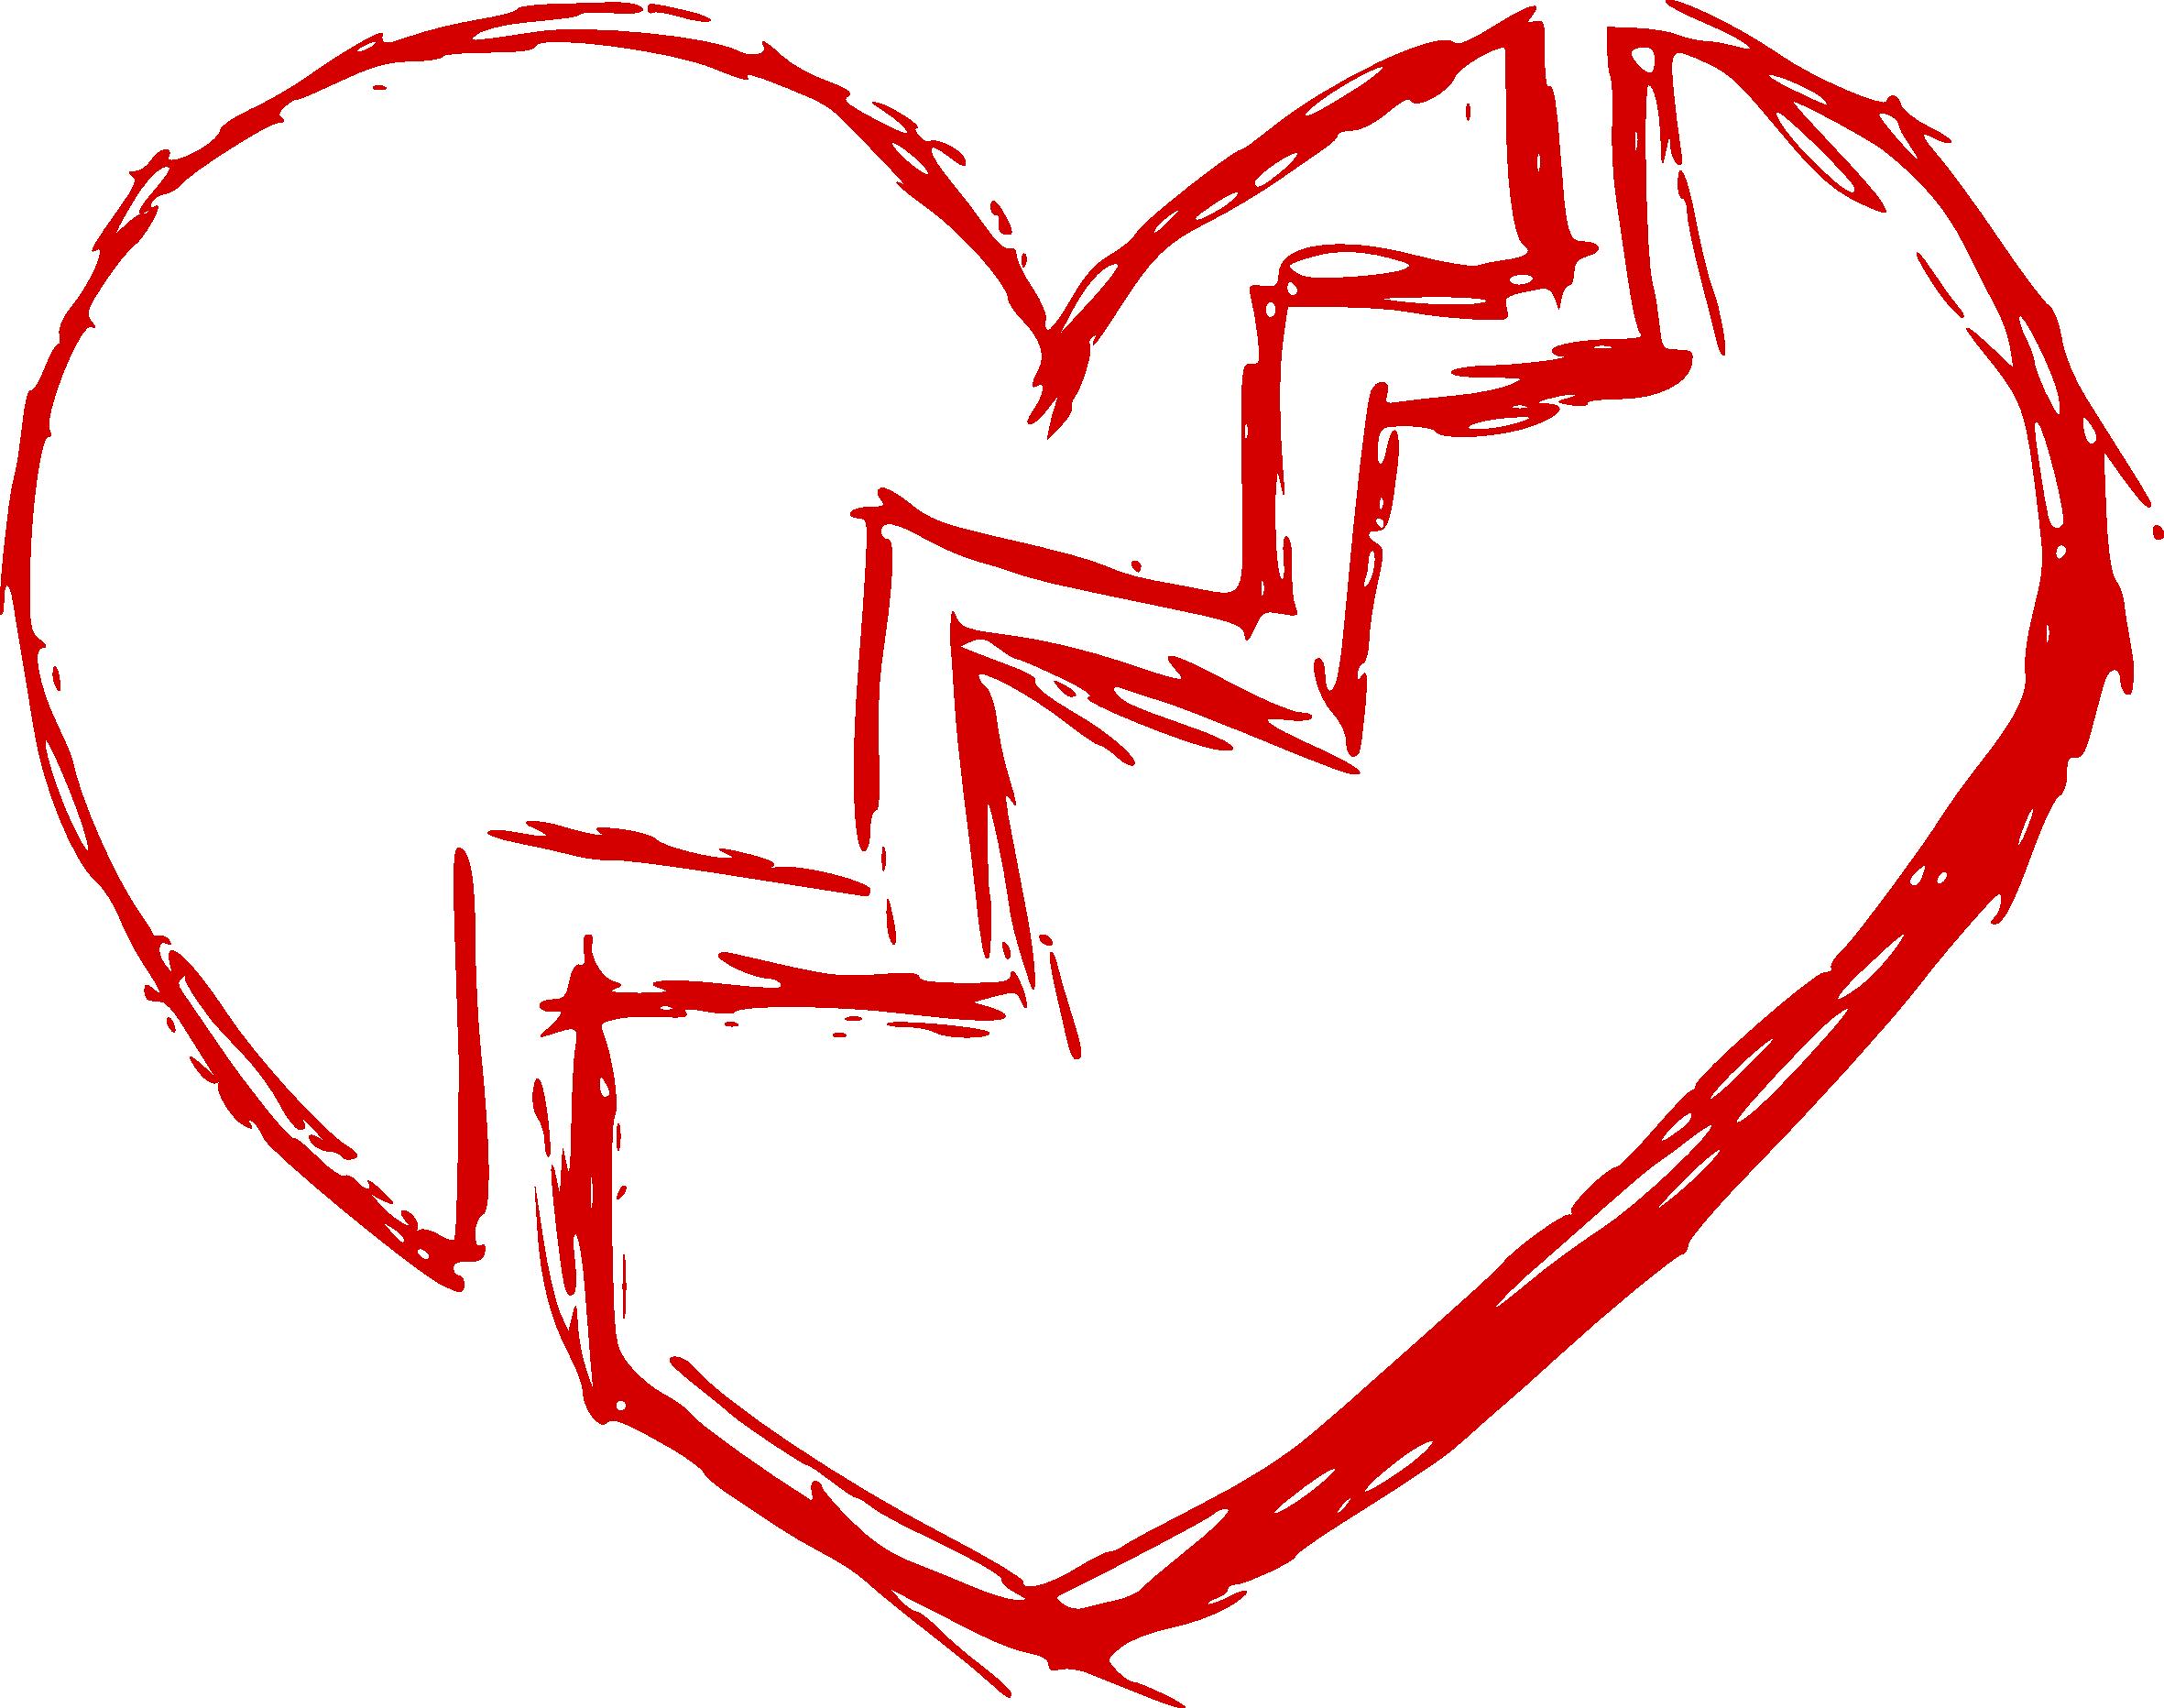 Free broken heart clipart graphic download Broken Heart (PNG Transparent) | OnlyGFX.com graphic download